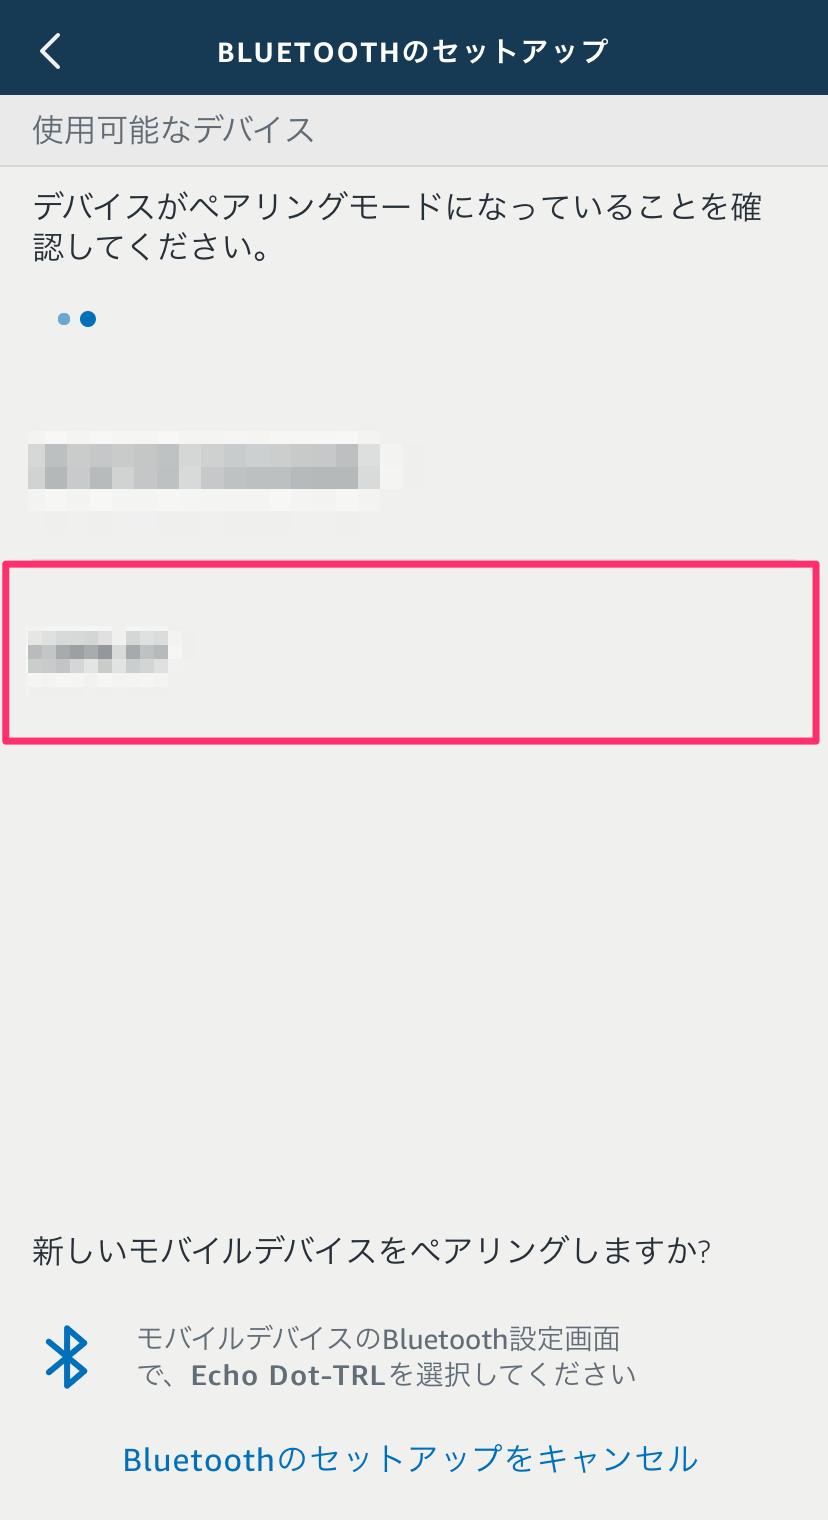 Amazon Echo DotのBluetooth接続方法 STEP8